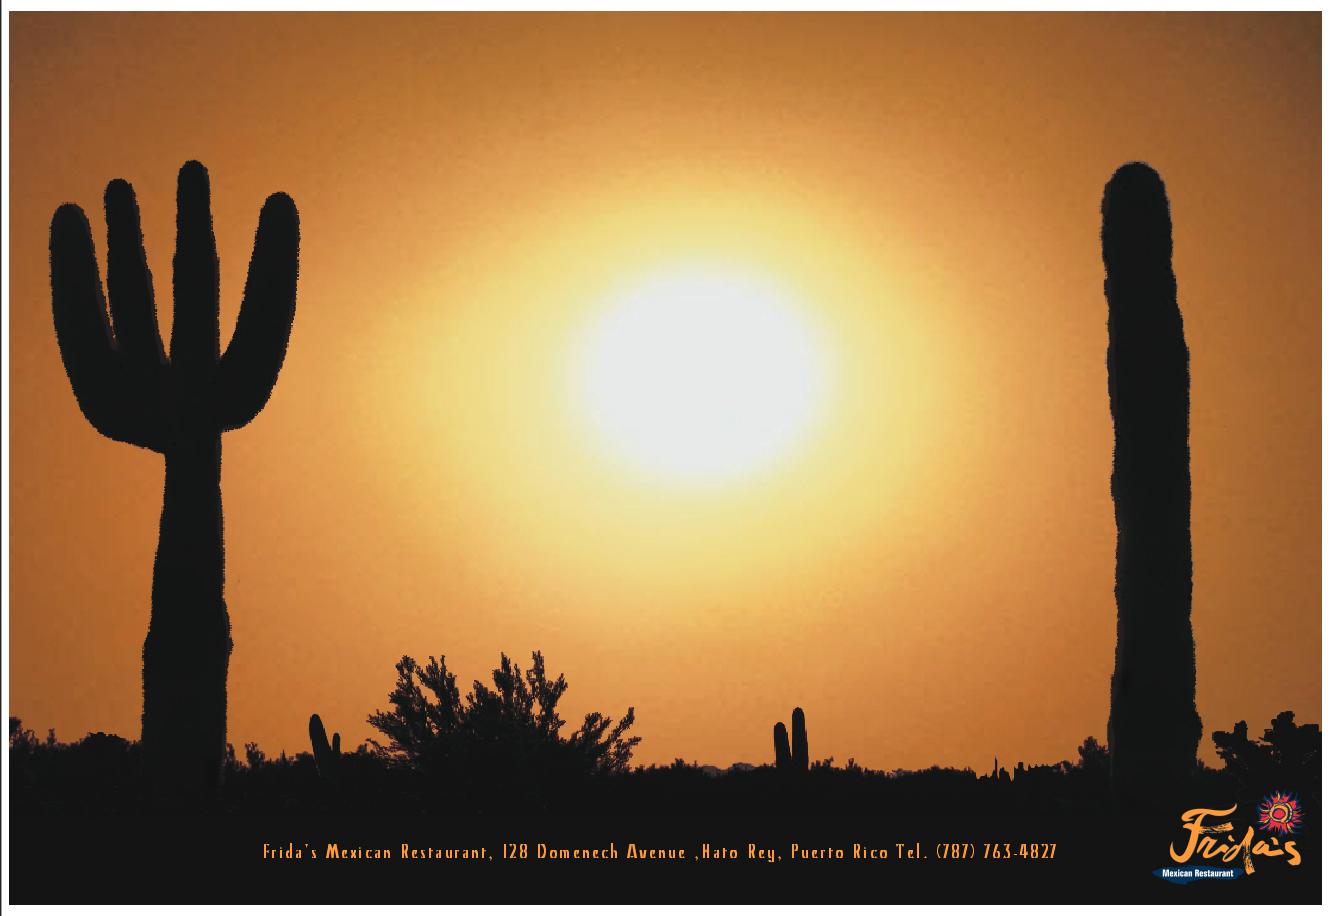 Frida's Mexican Restaurant-Cactus.jpg